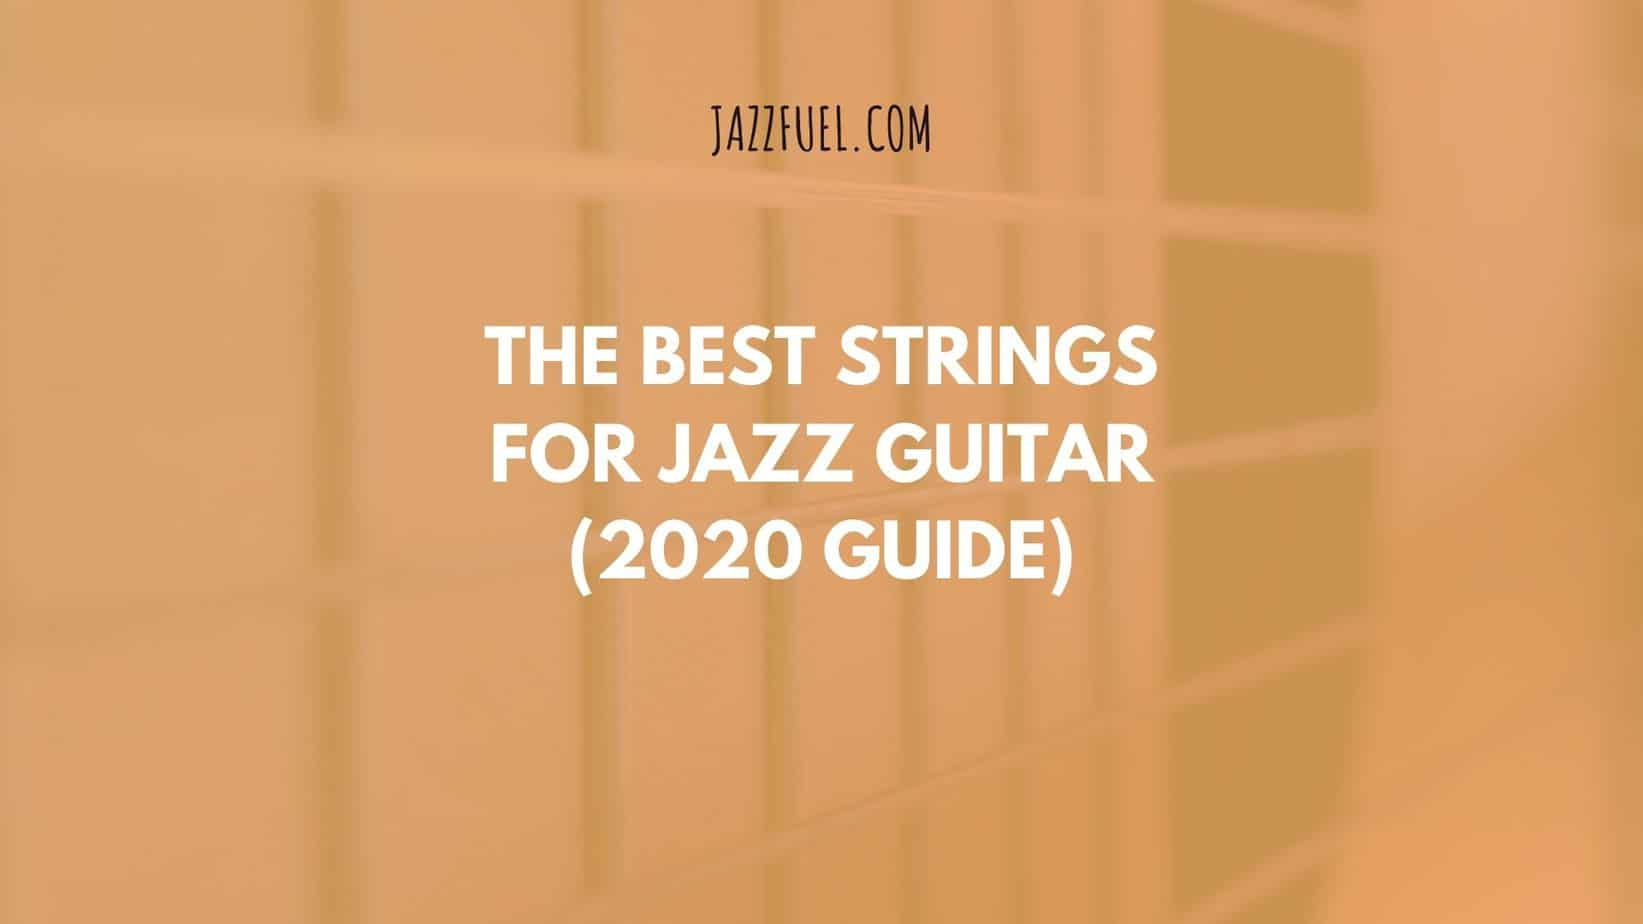 jazz guitar strings